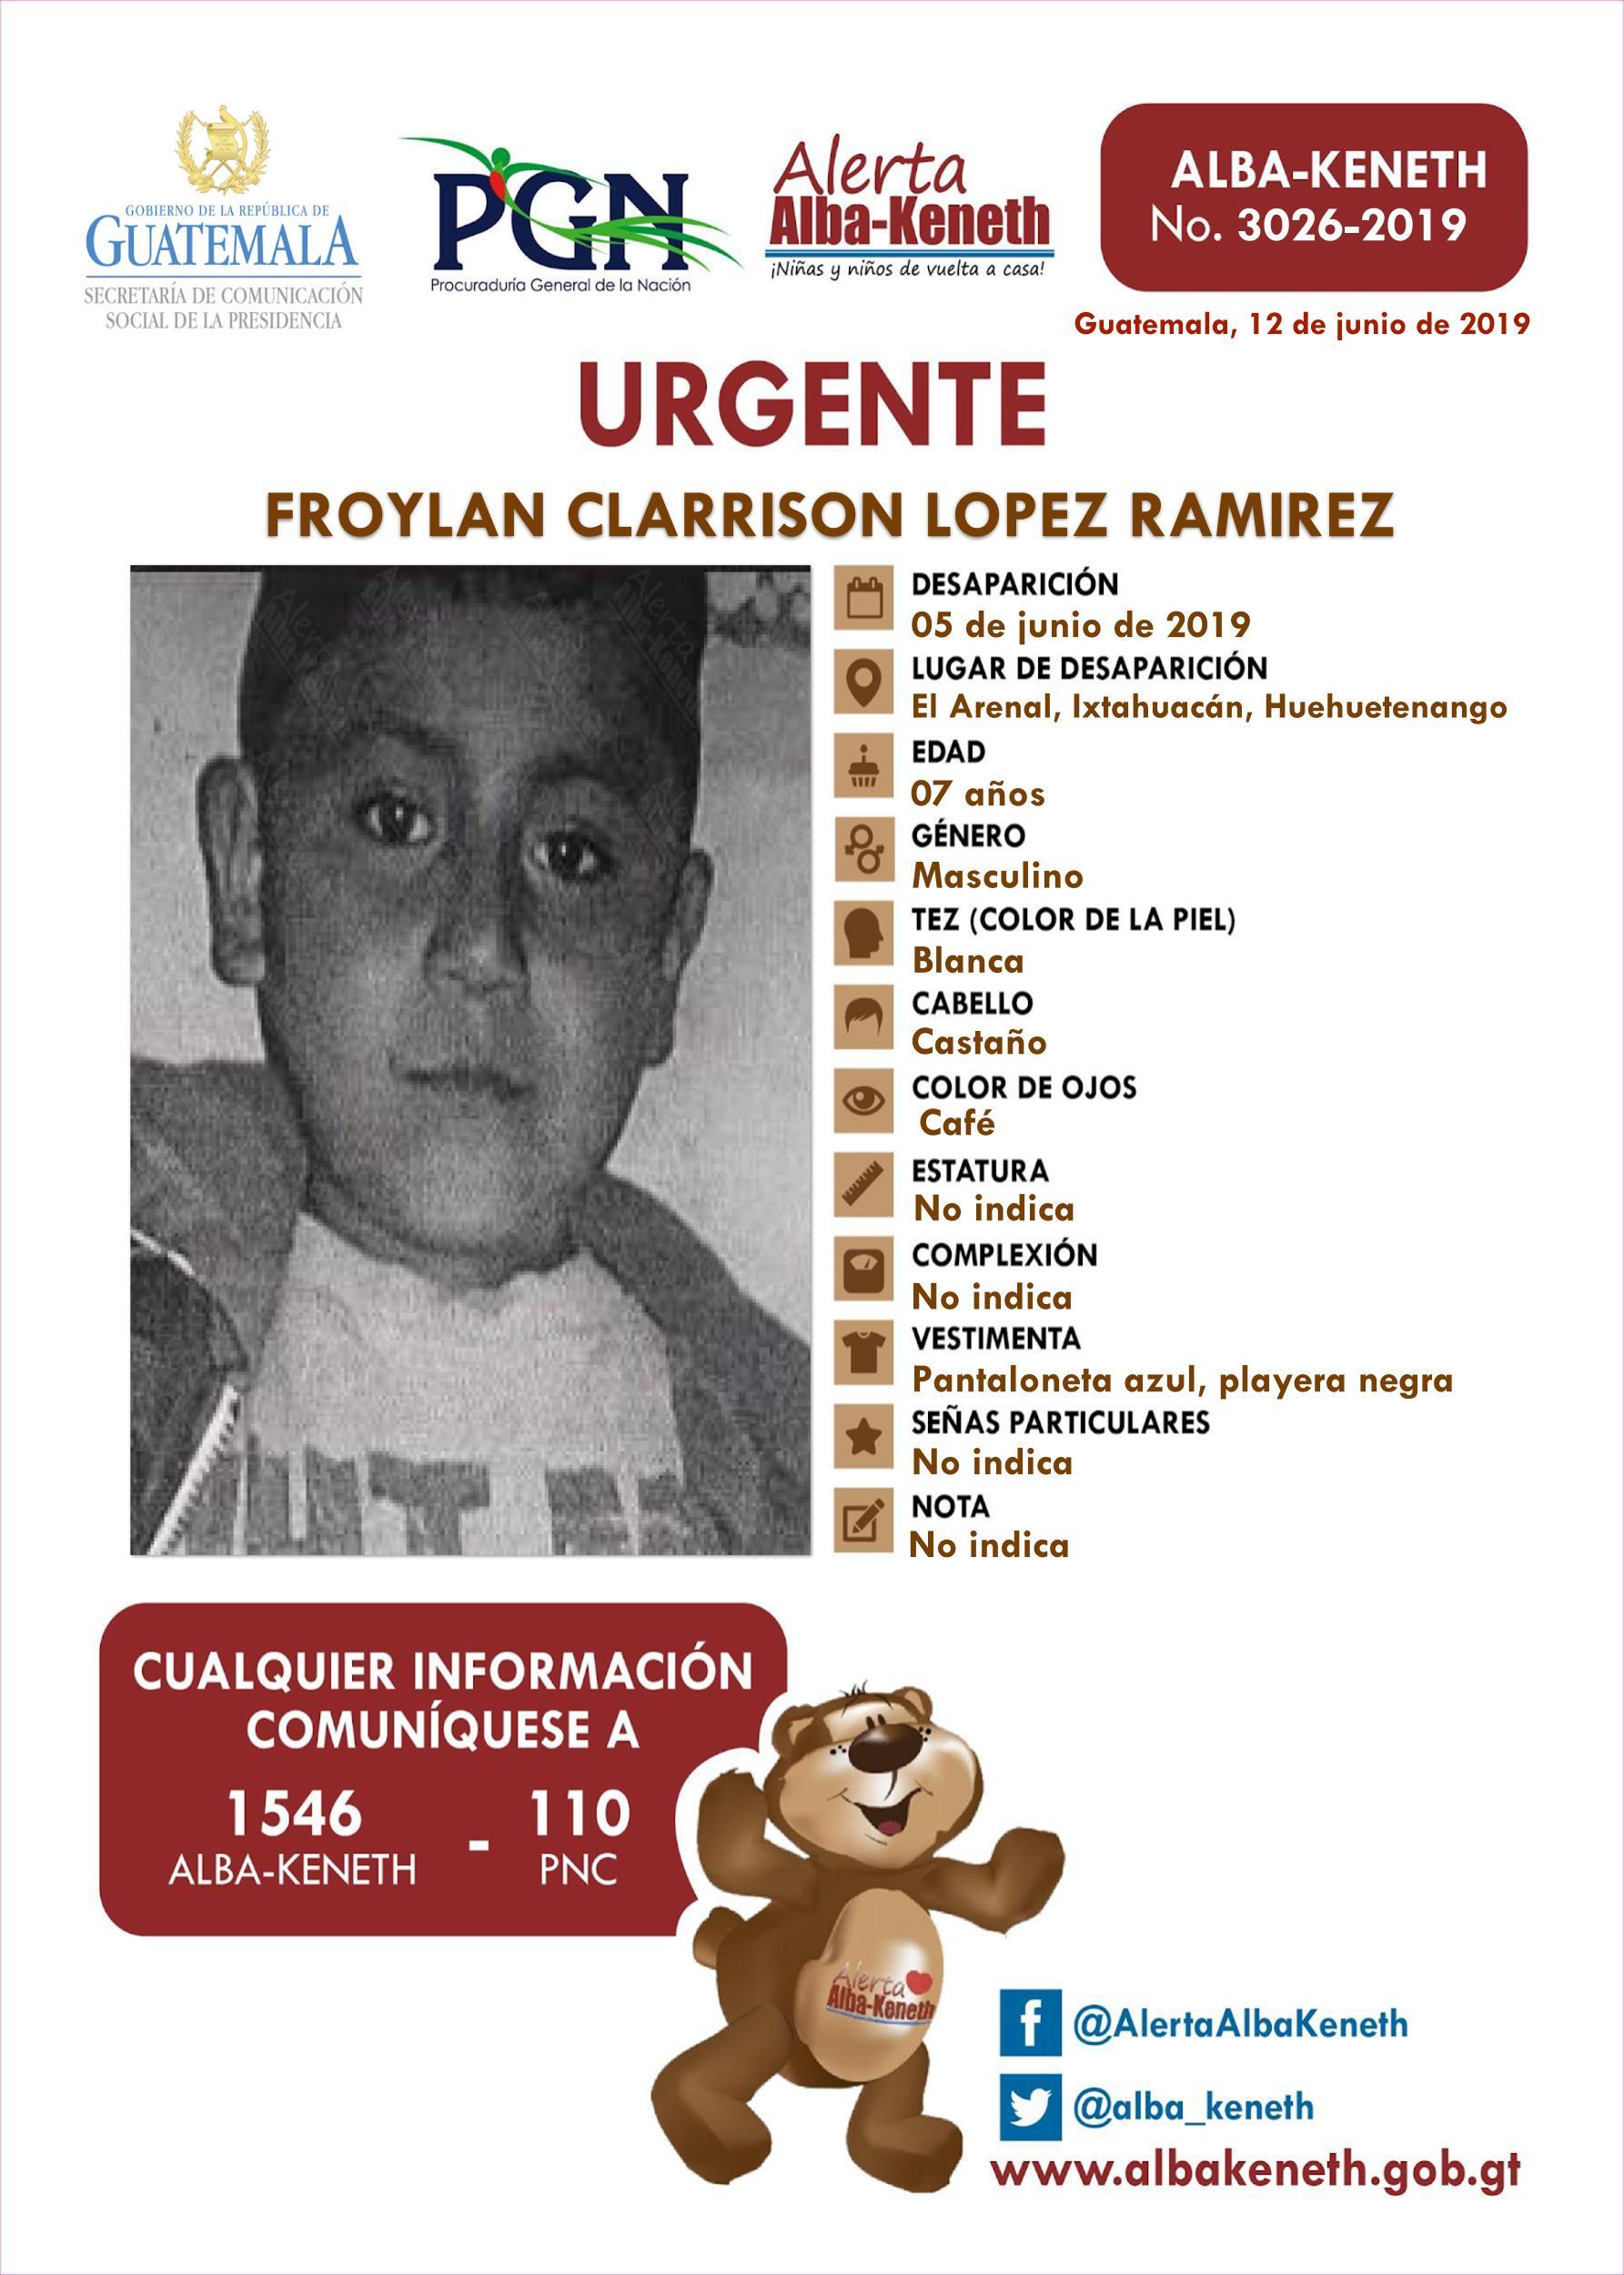 Froylan Clarrison Lopez Ramirez